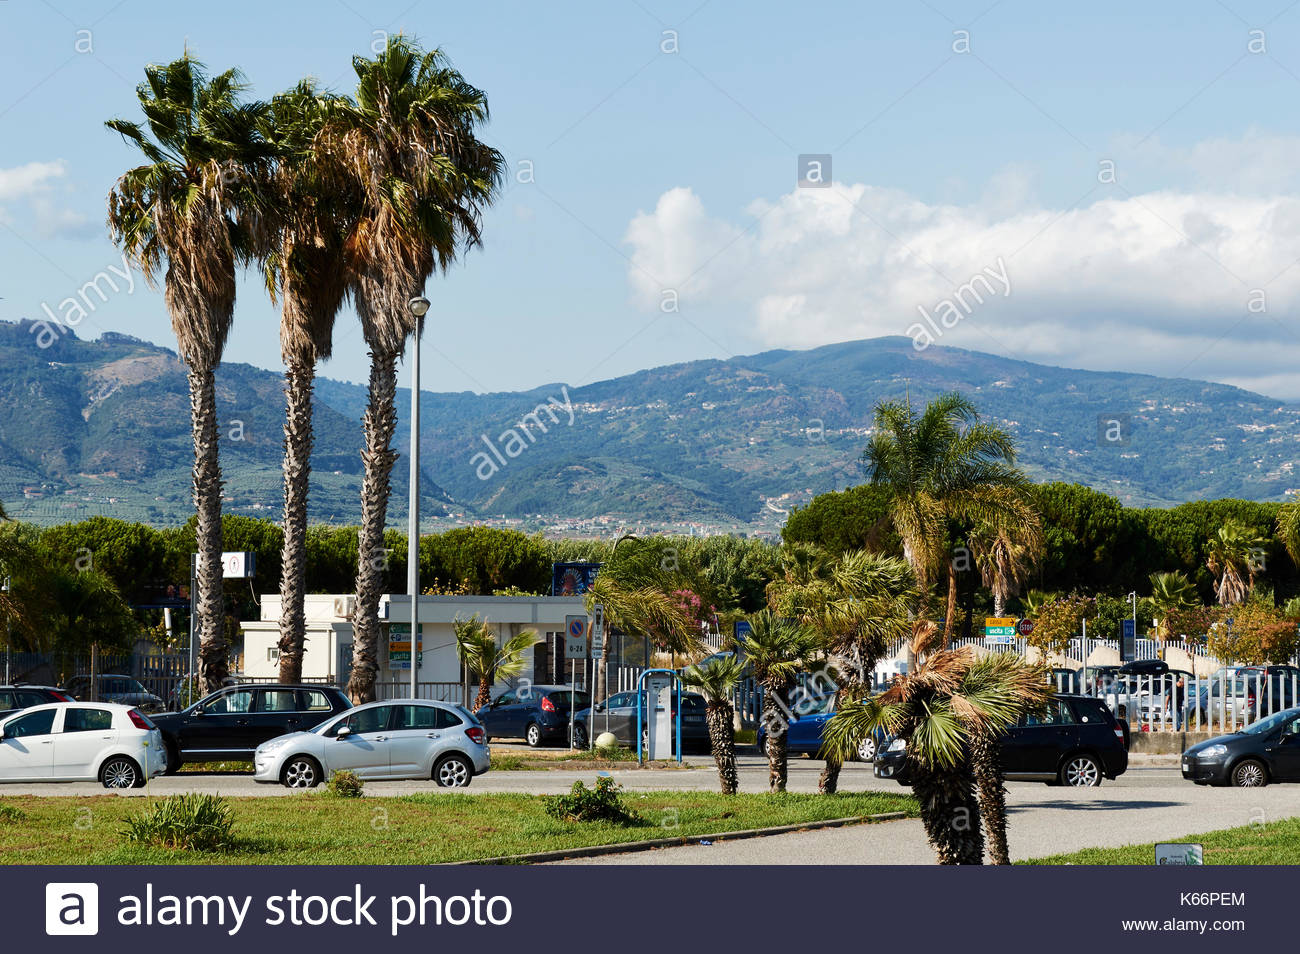 Lamezia Terme, Calabria, Italy - August 15, 2017: Lamezia ...